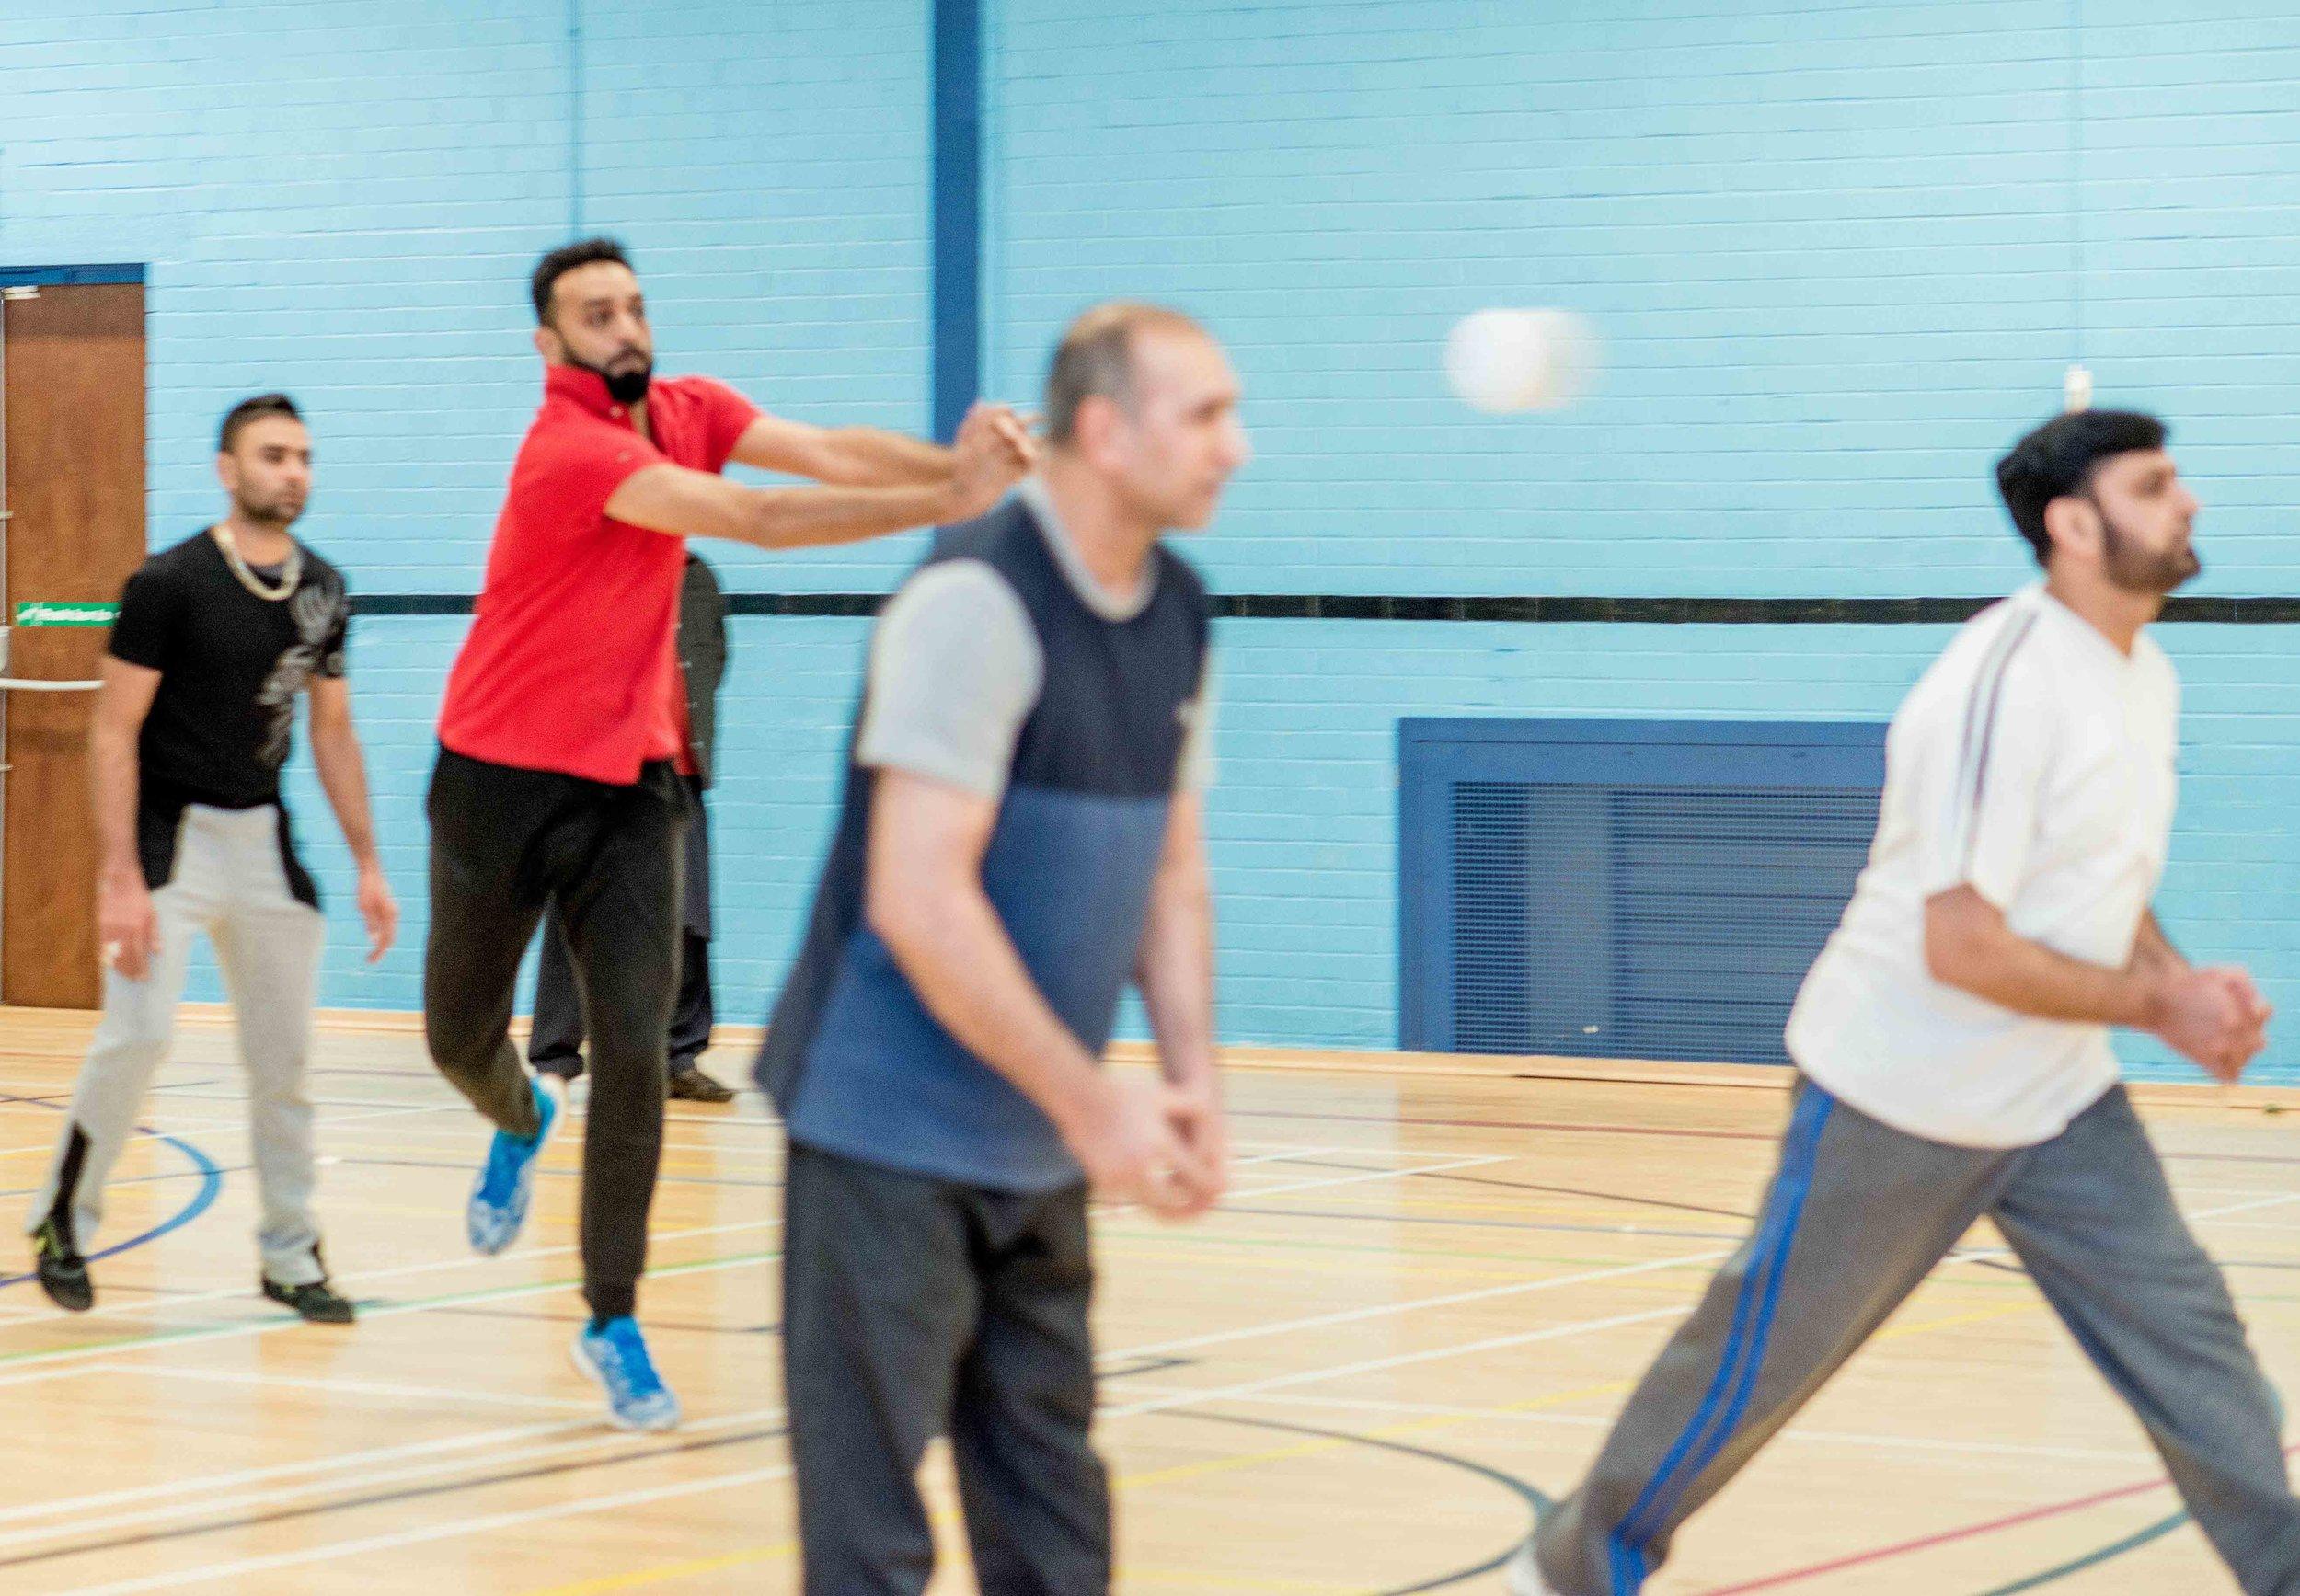 Volleyball - 3rd December 2017, Parkside Centre, Bradford